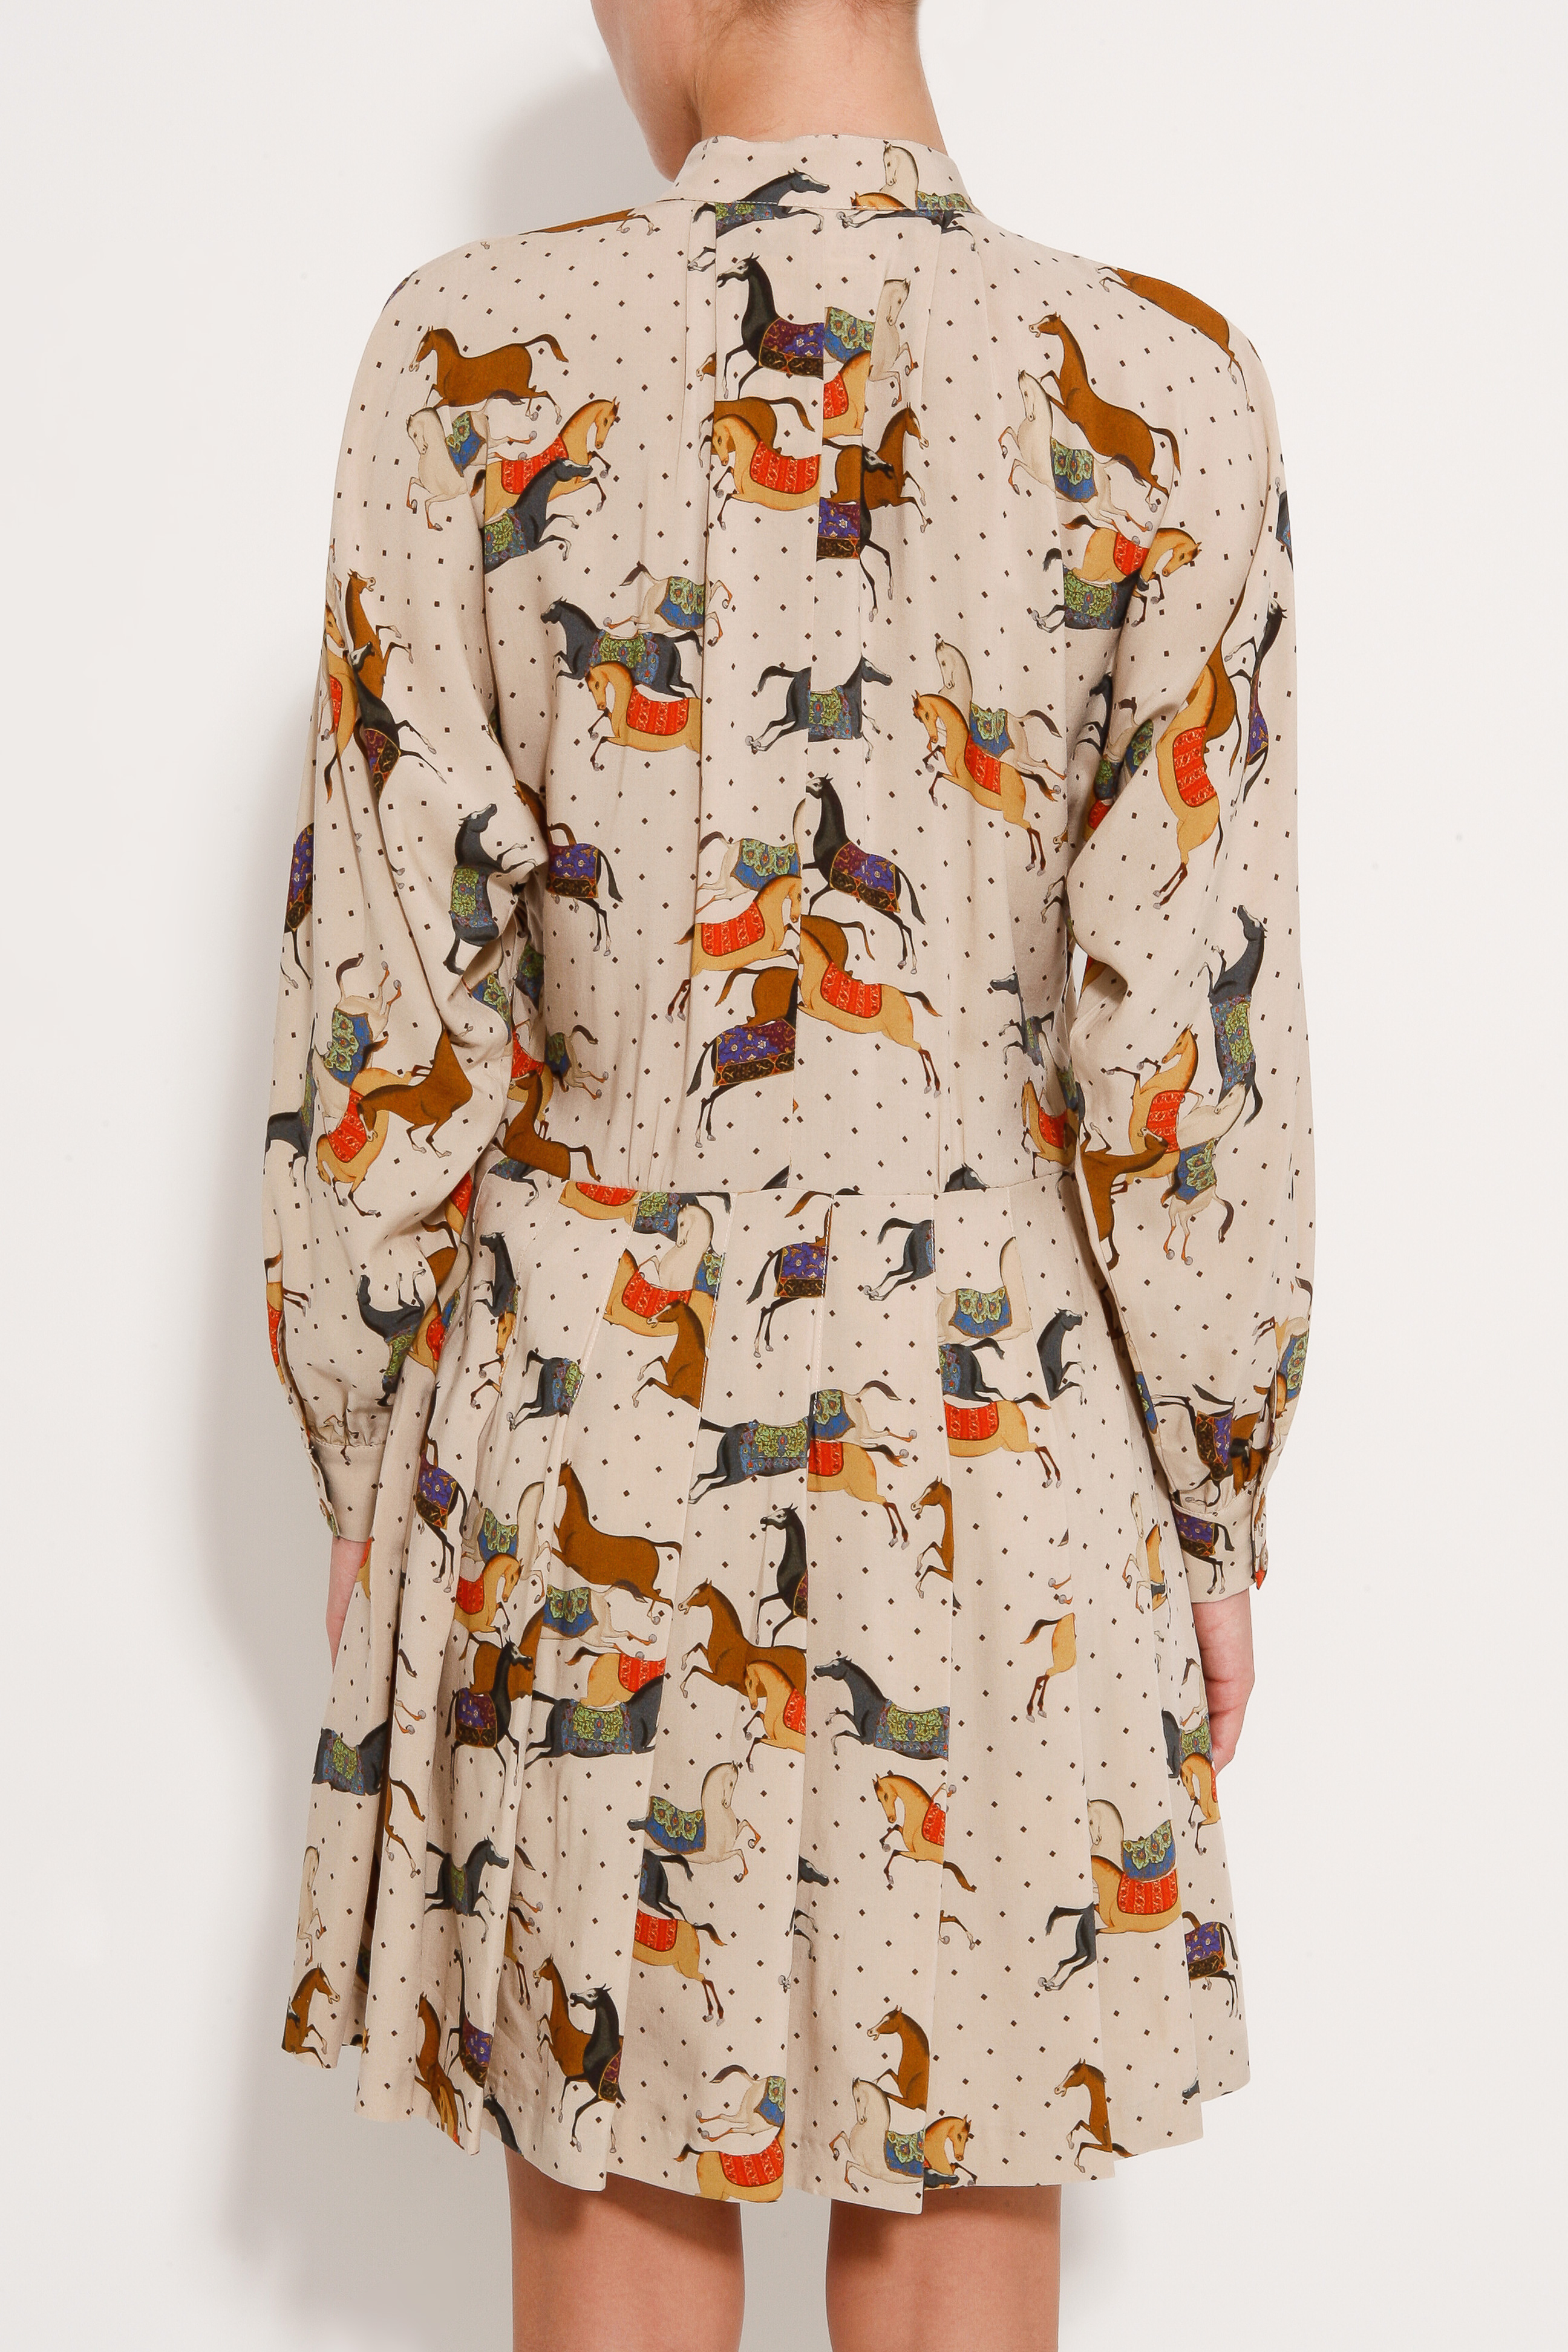 Paul Amp Joe Horse Print Dress In Beige Natural Lyst